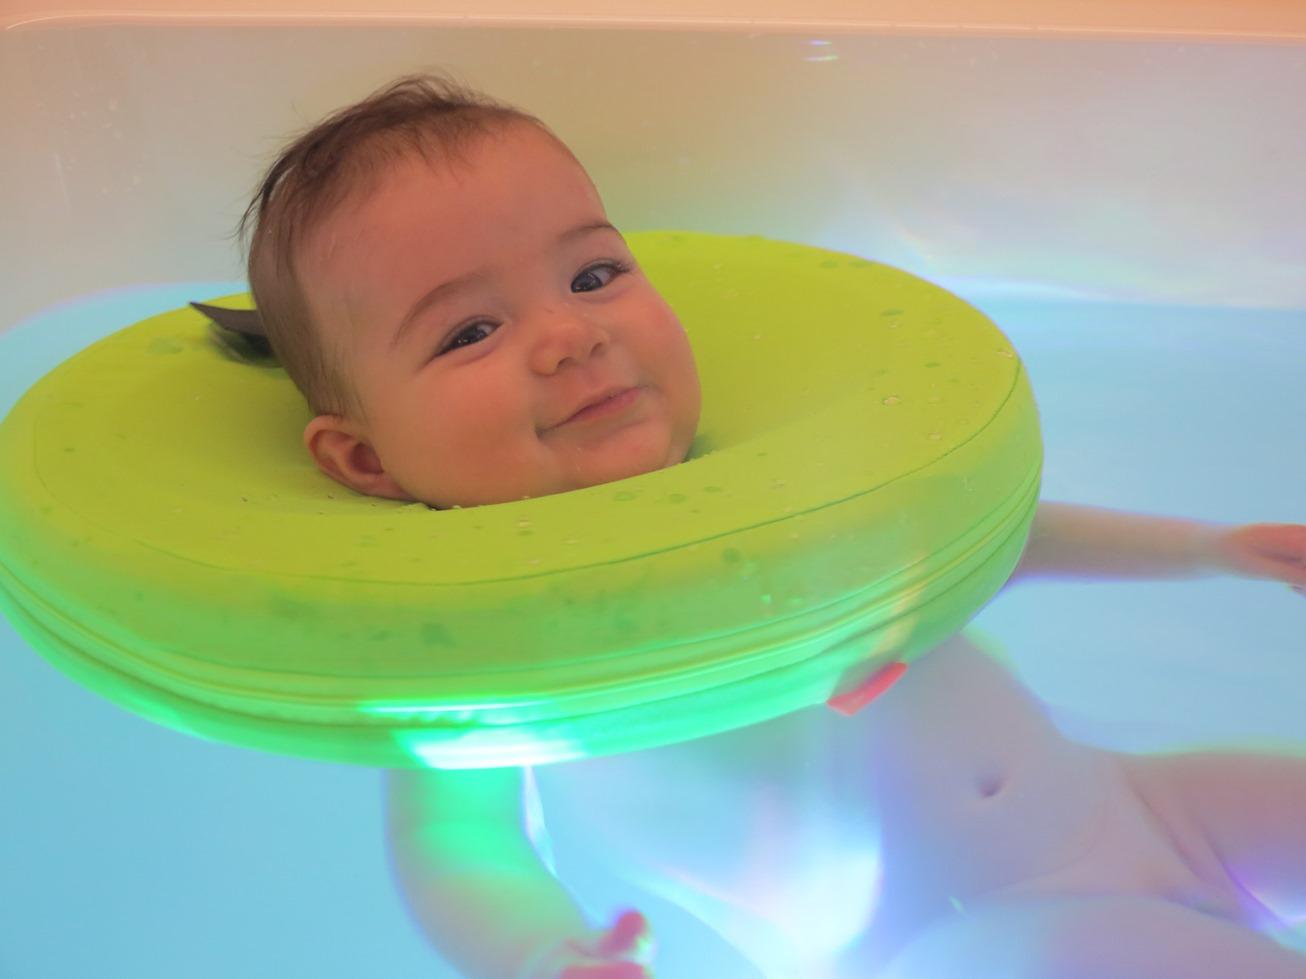 Bambino in piscina-Resort e SPA Tata-O-Palazzago-Bergamo